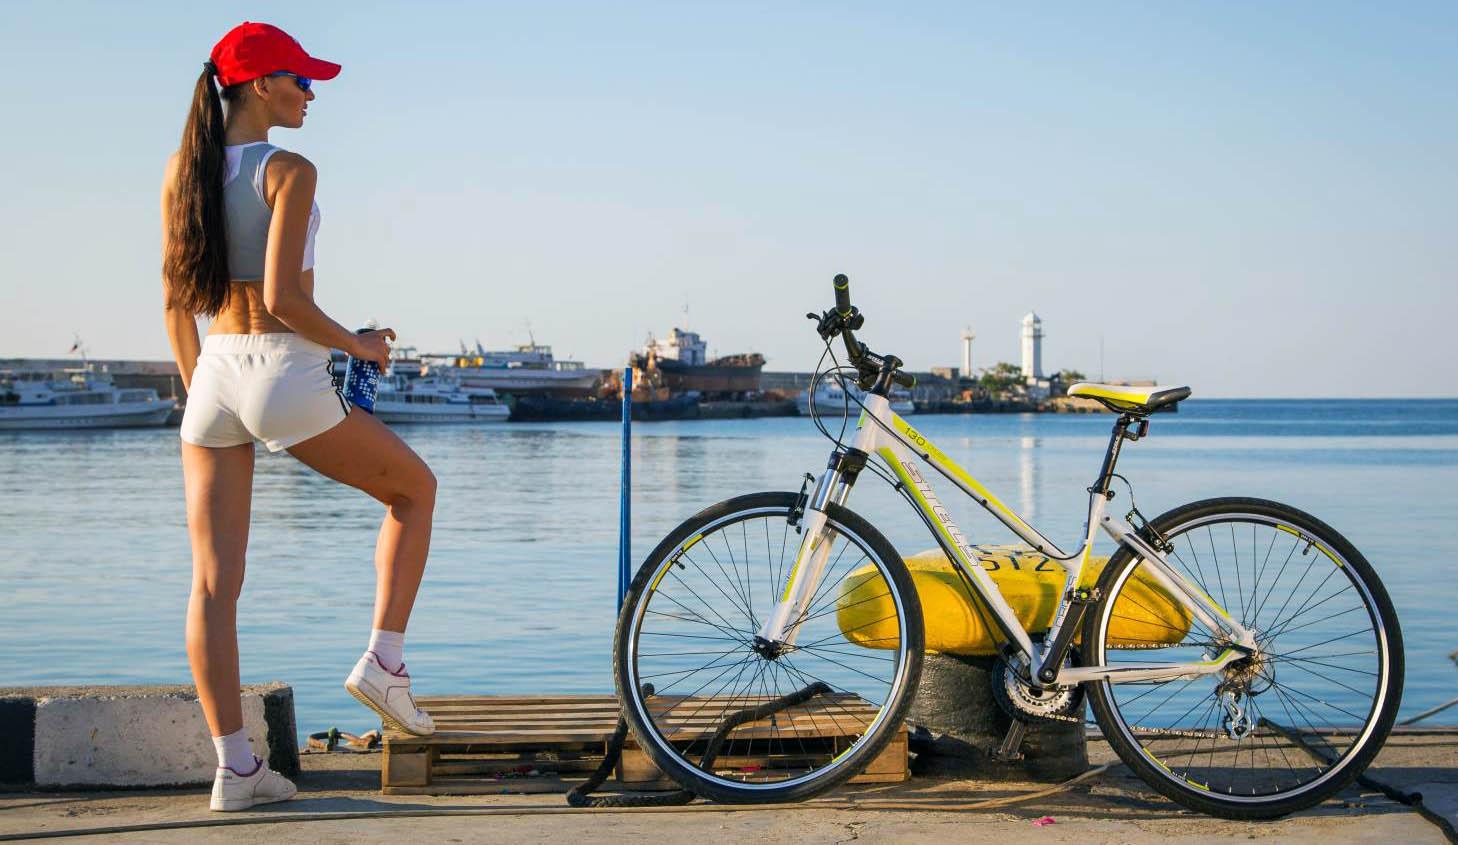 КАК ЕЗДА НА ВЕЛОСИПЕДЕ ВЛИЯЕТ НА ФИГУРУ? Польза или вред? - Bike-Rampage